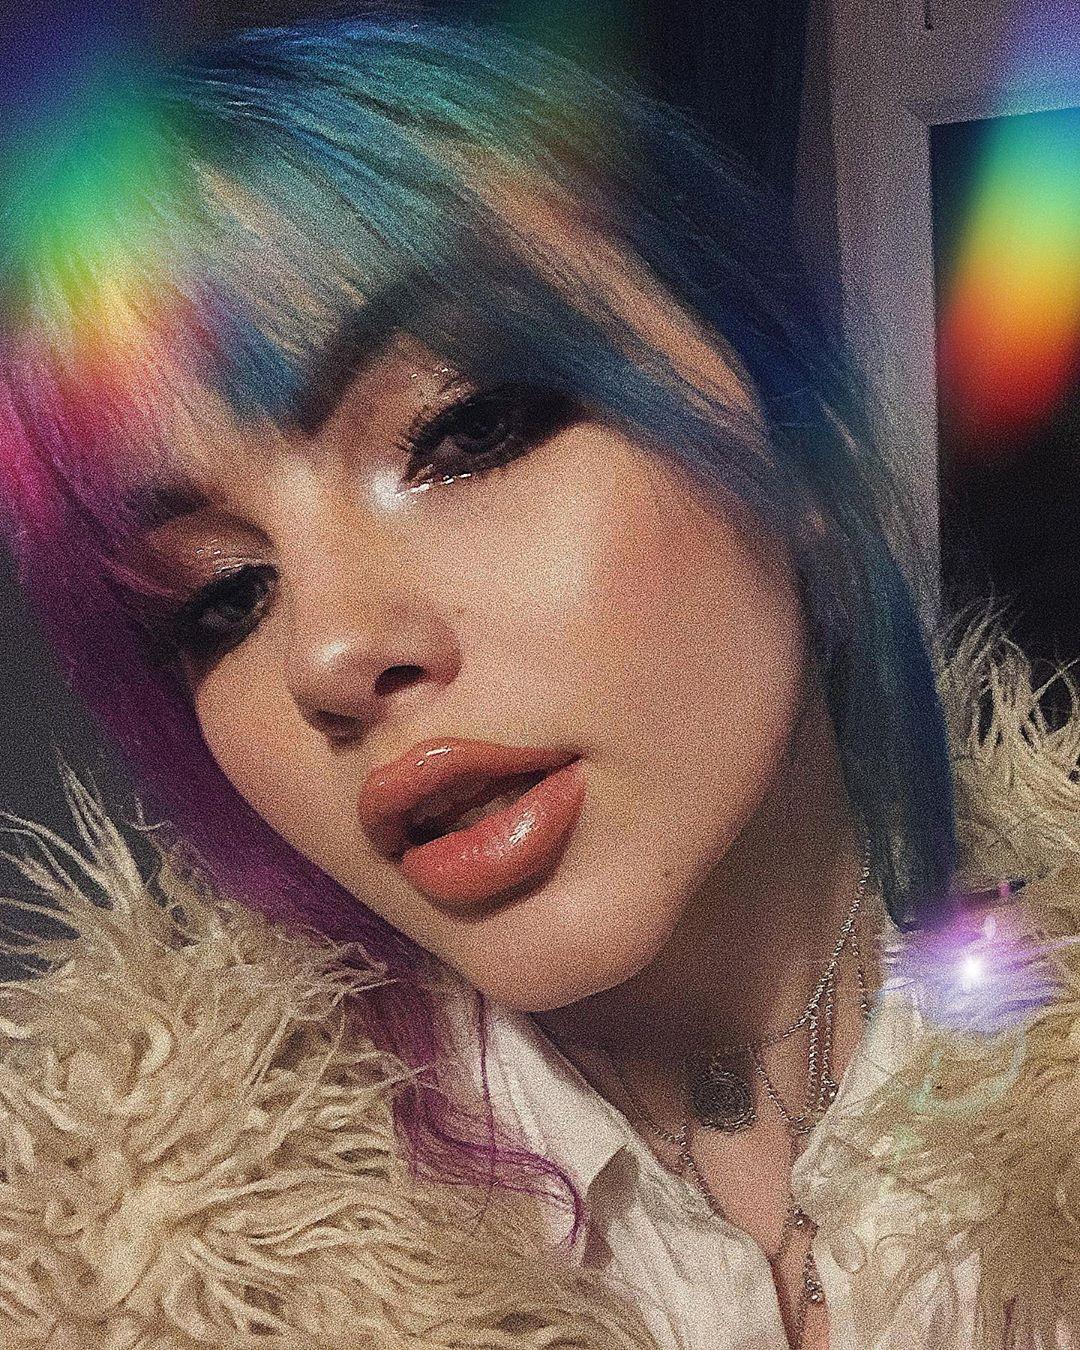 Sophia-Mitchell-Wallpapers-Insta-Fit-Bio-6